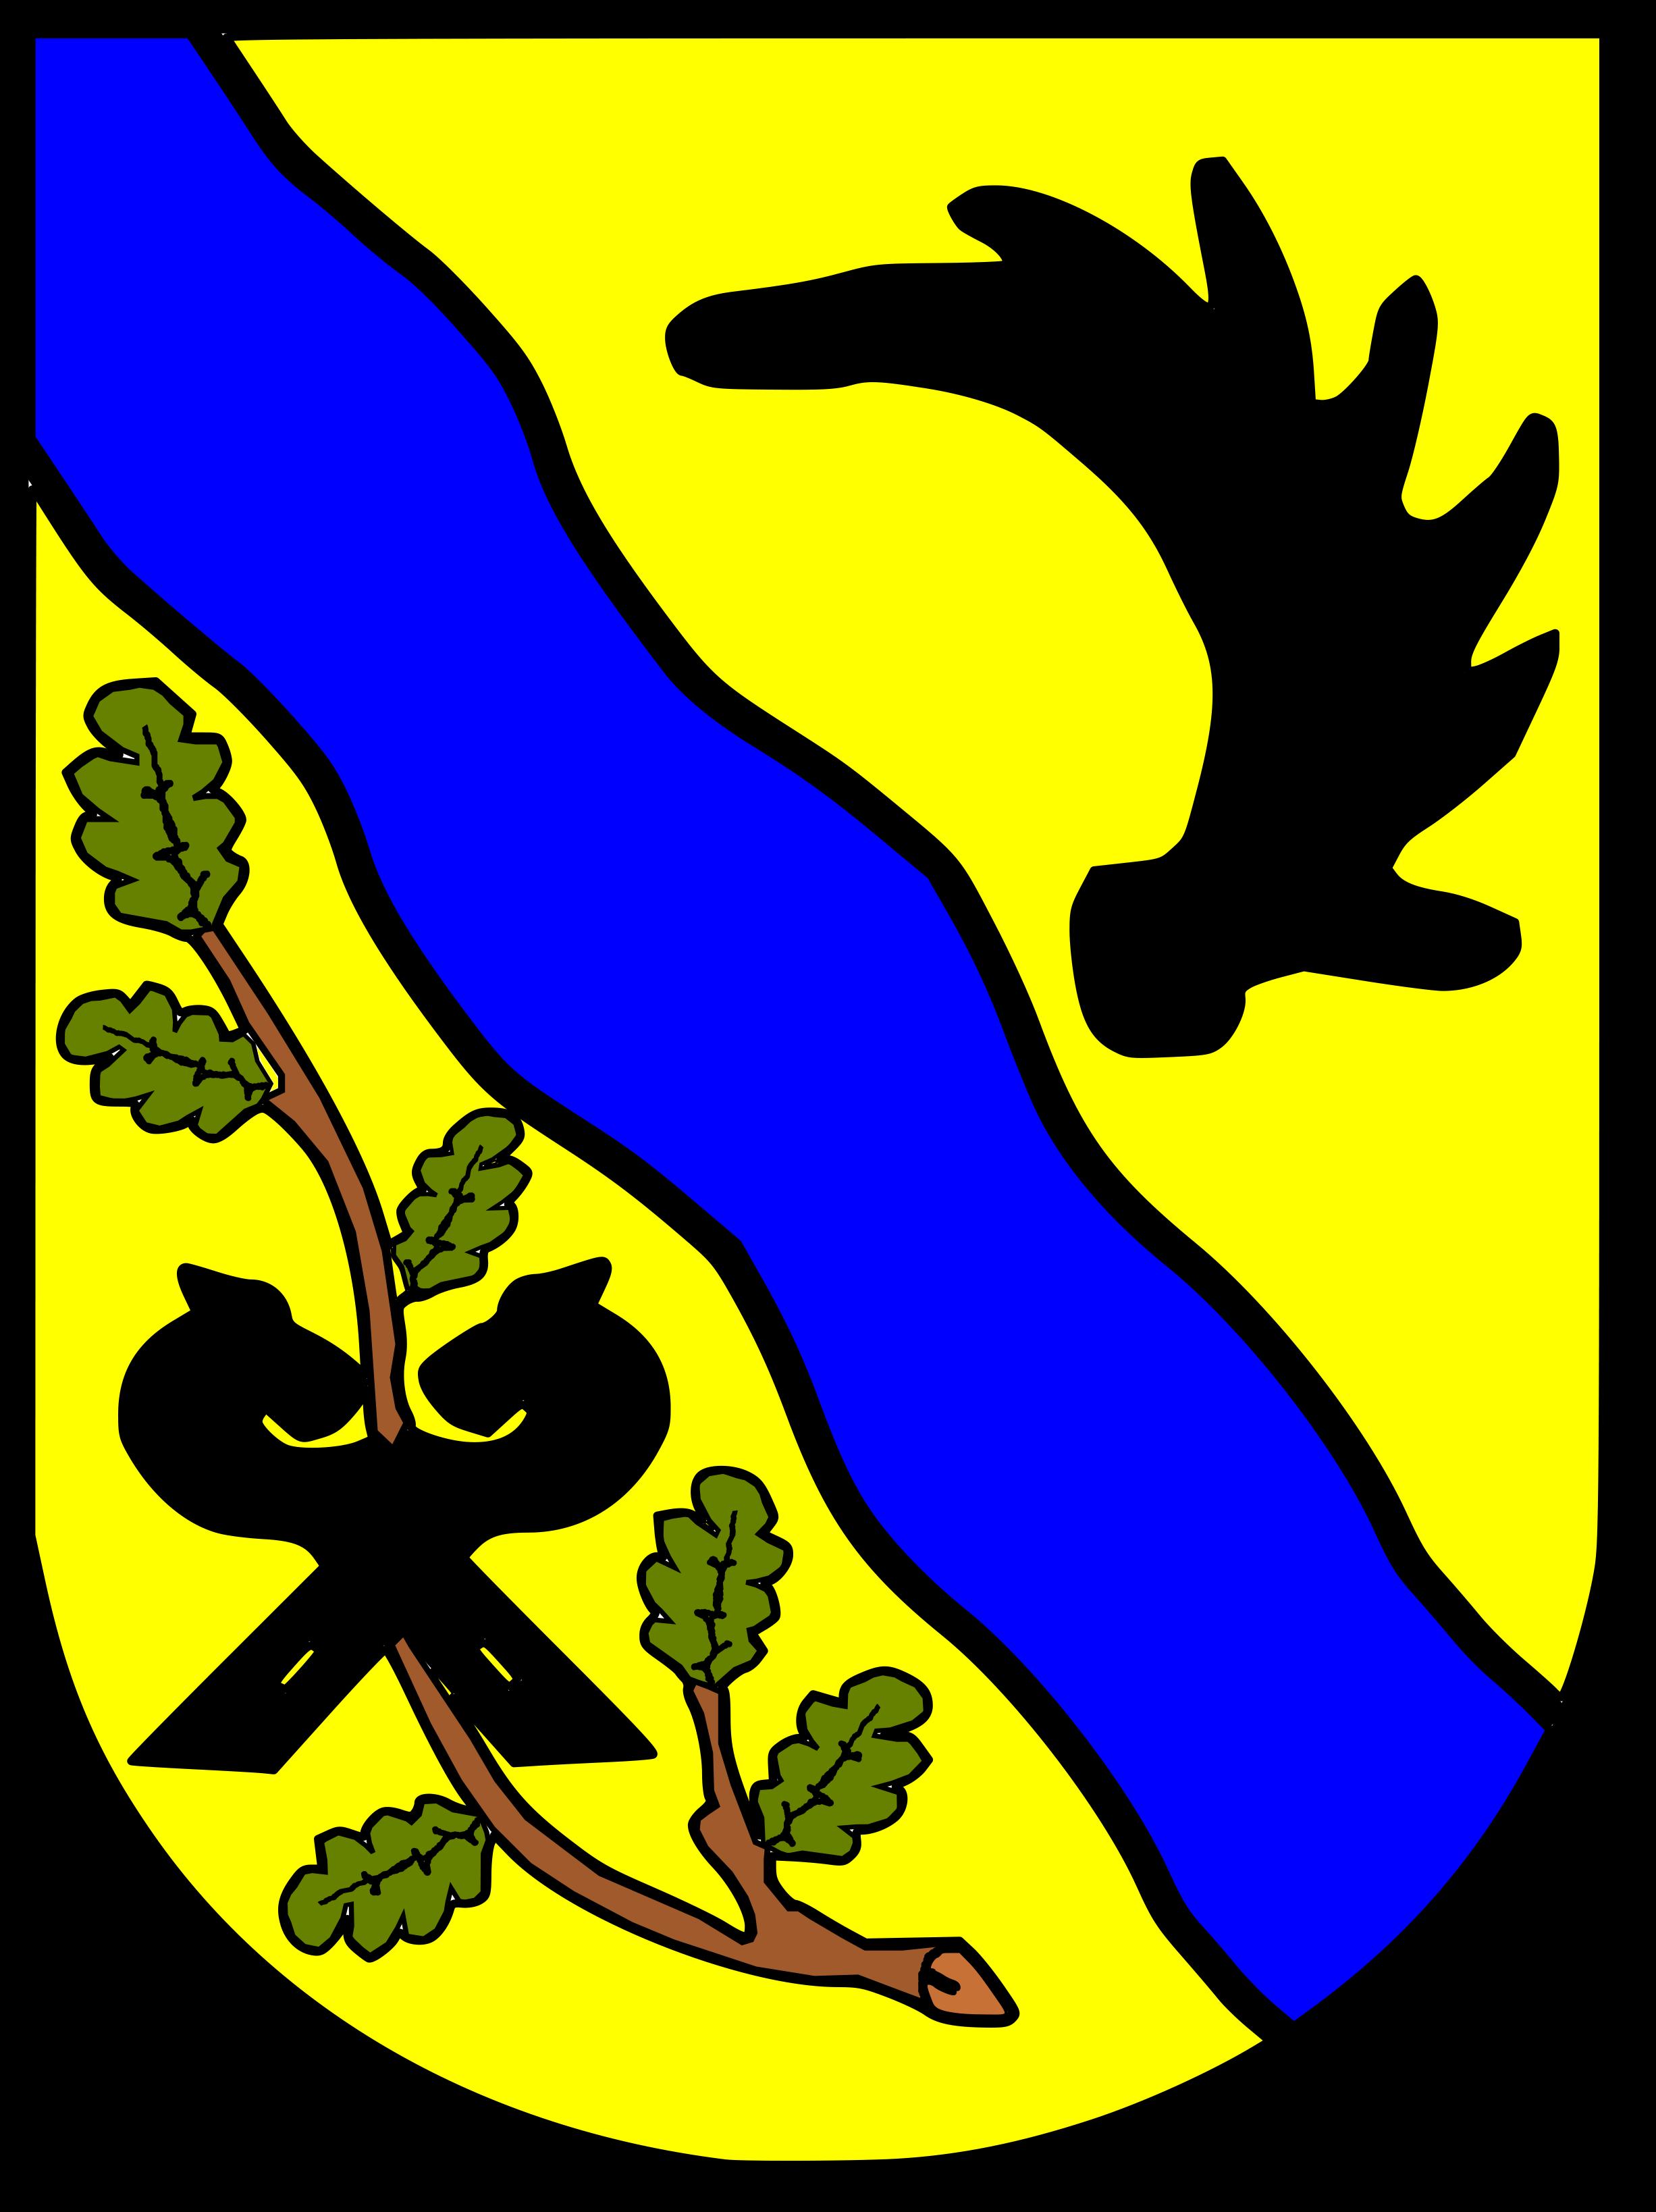 Freiwillige Feuerwehr Bavendorf